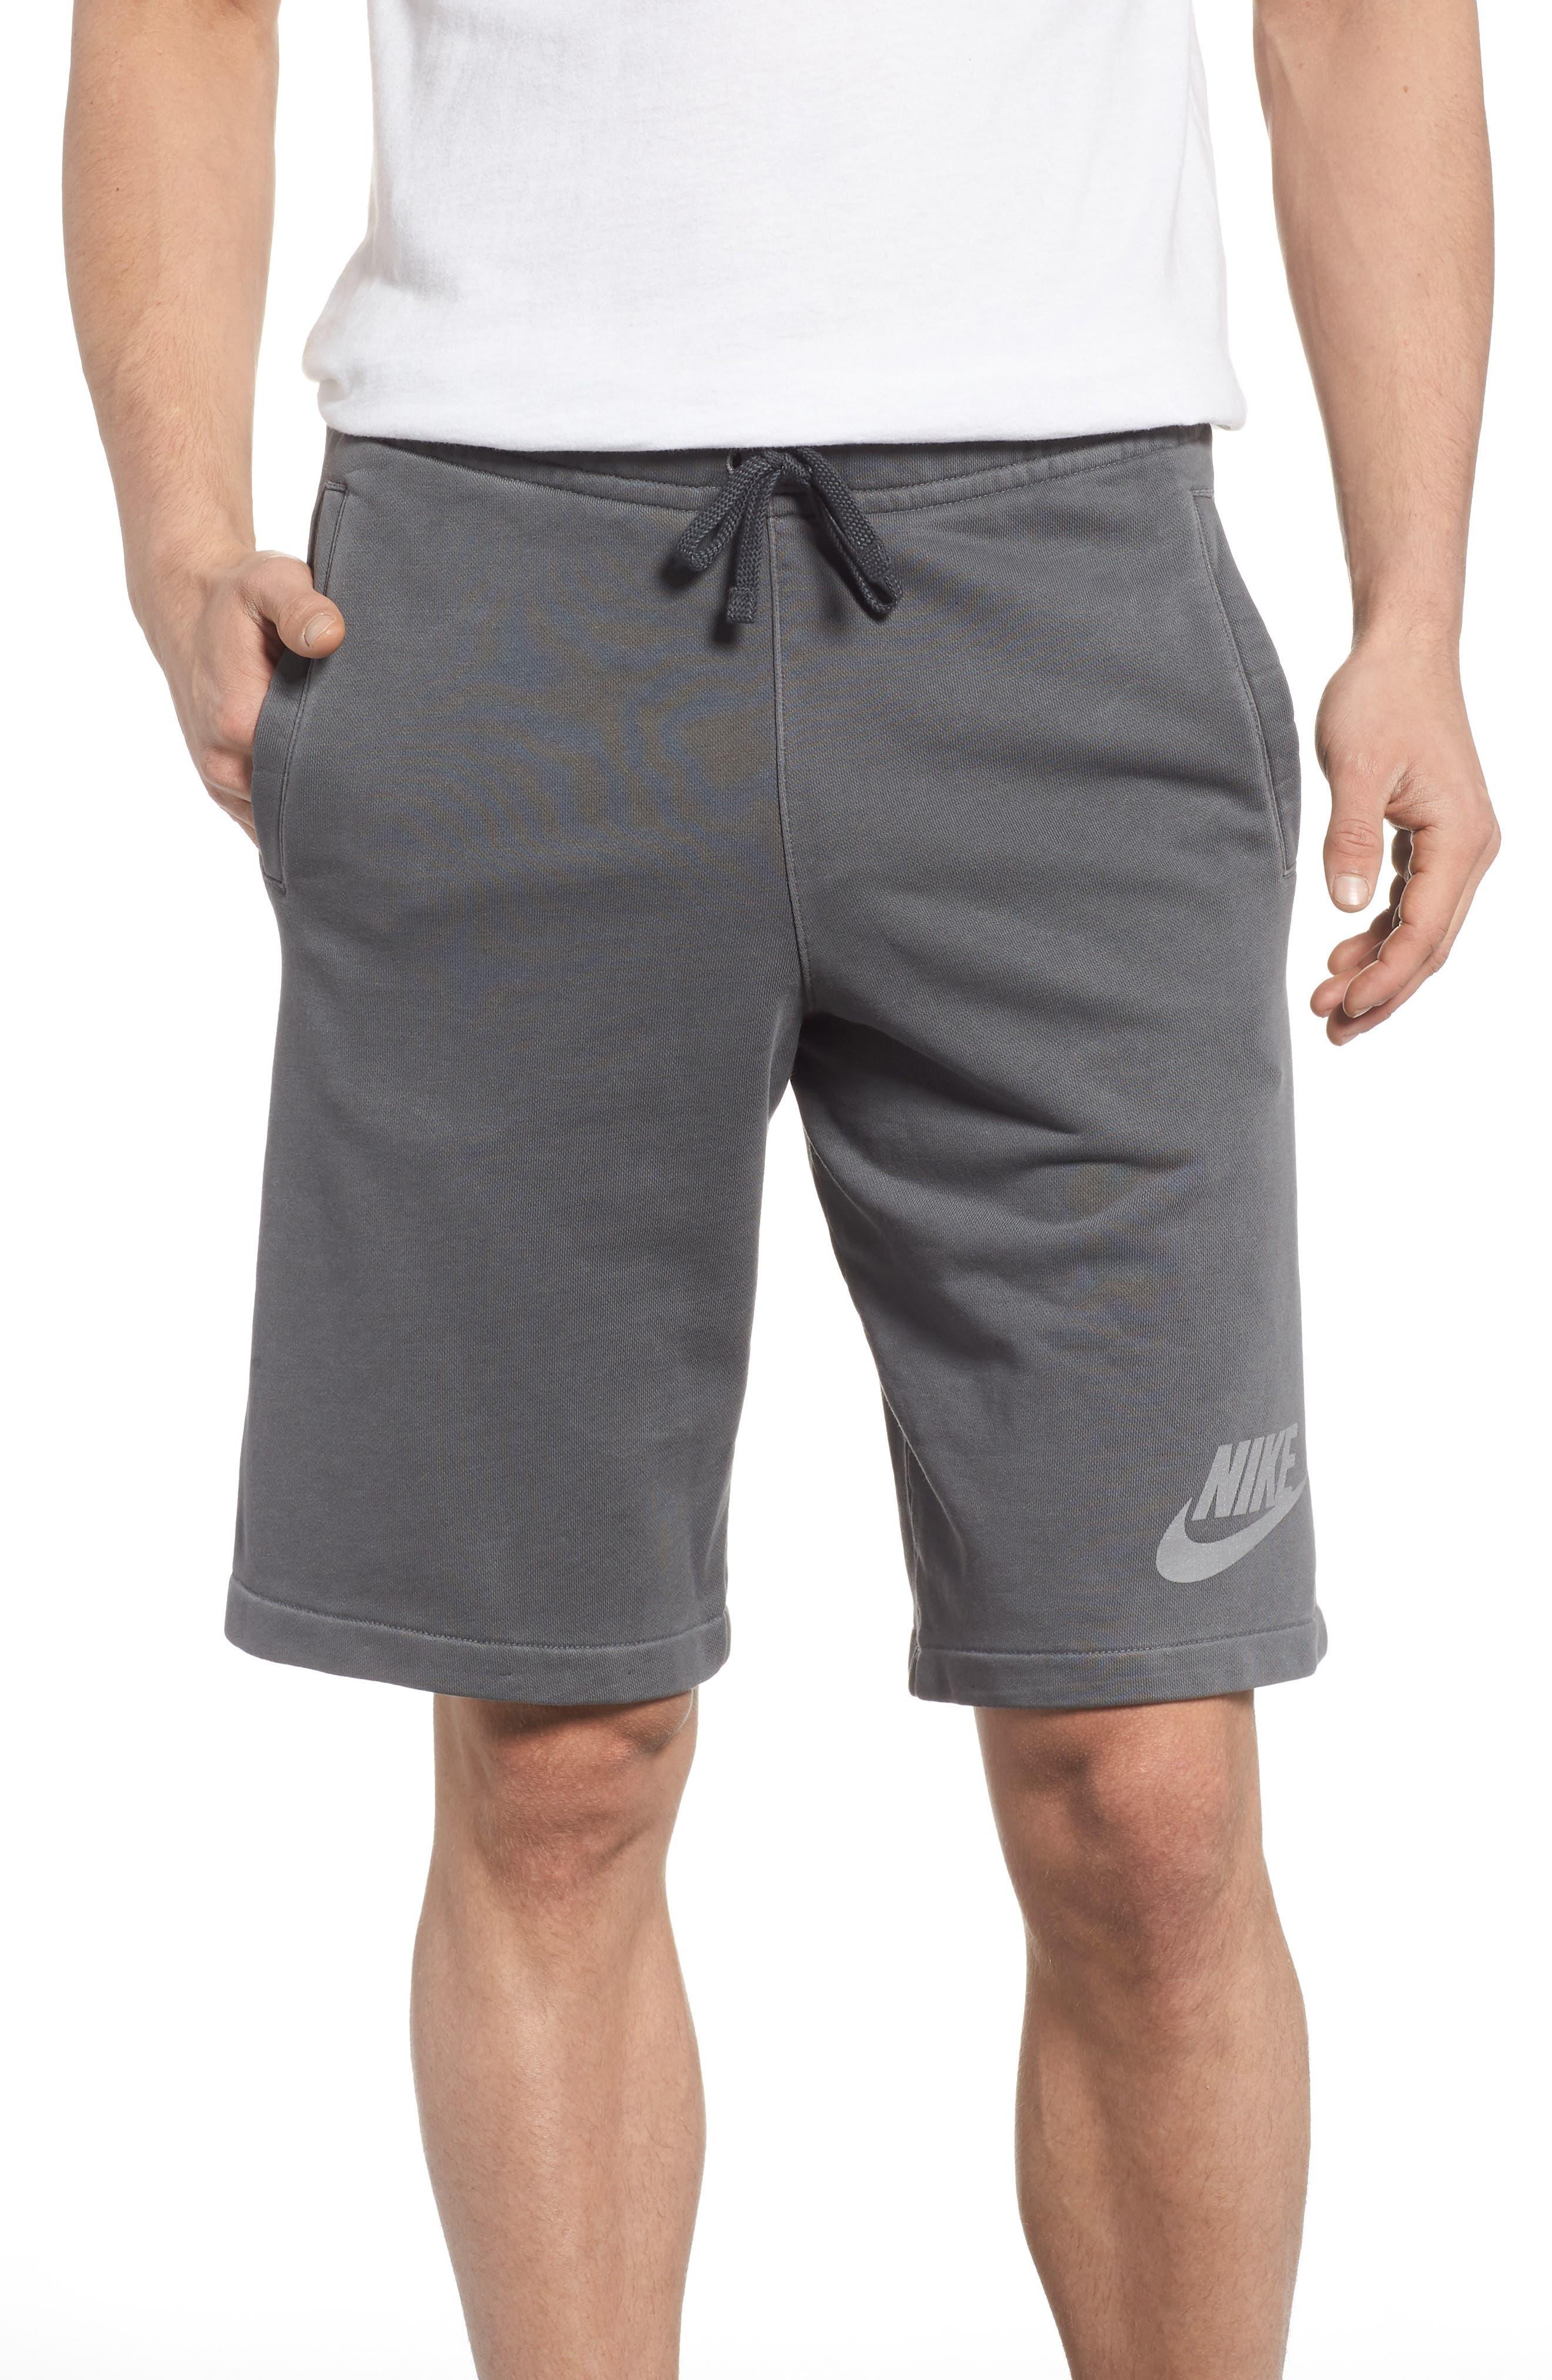 NSW Cotton Blend Shorts,                             Main thumbnail 1, color,                             010